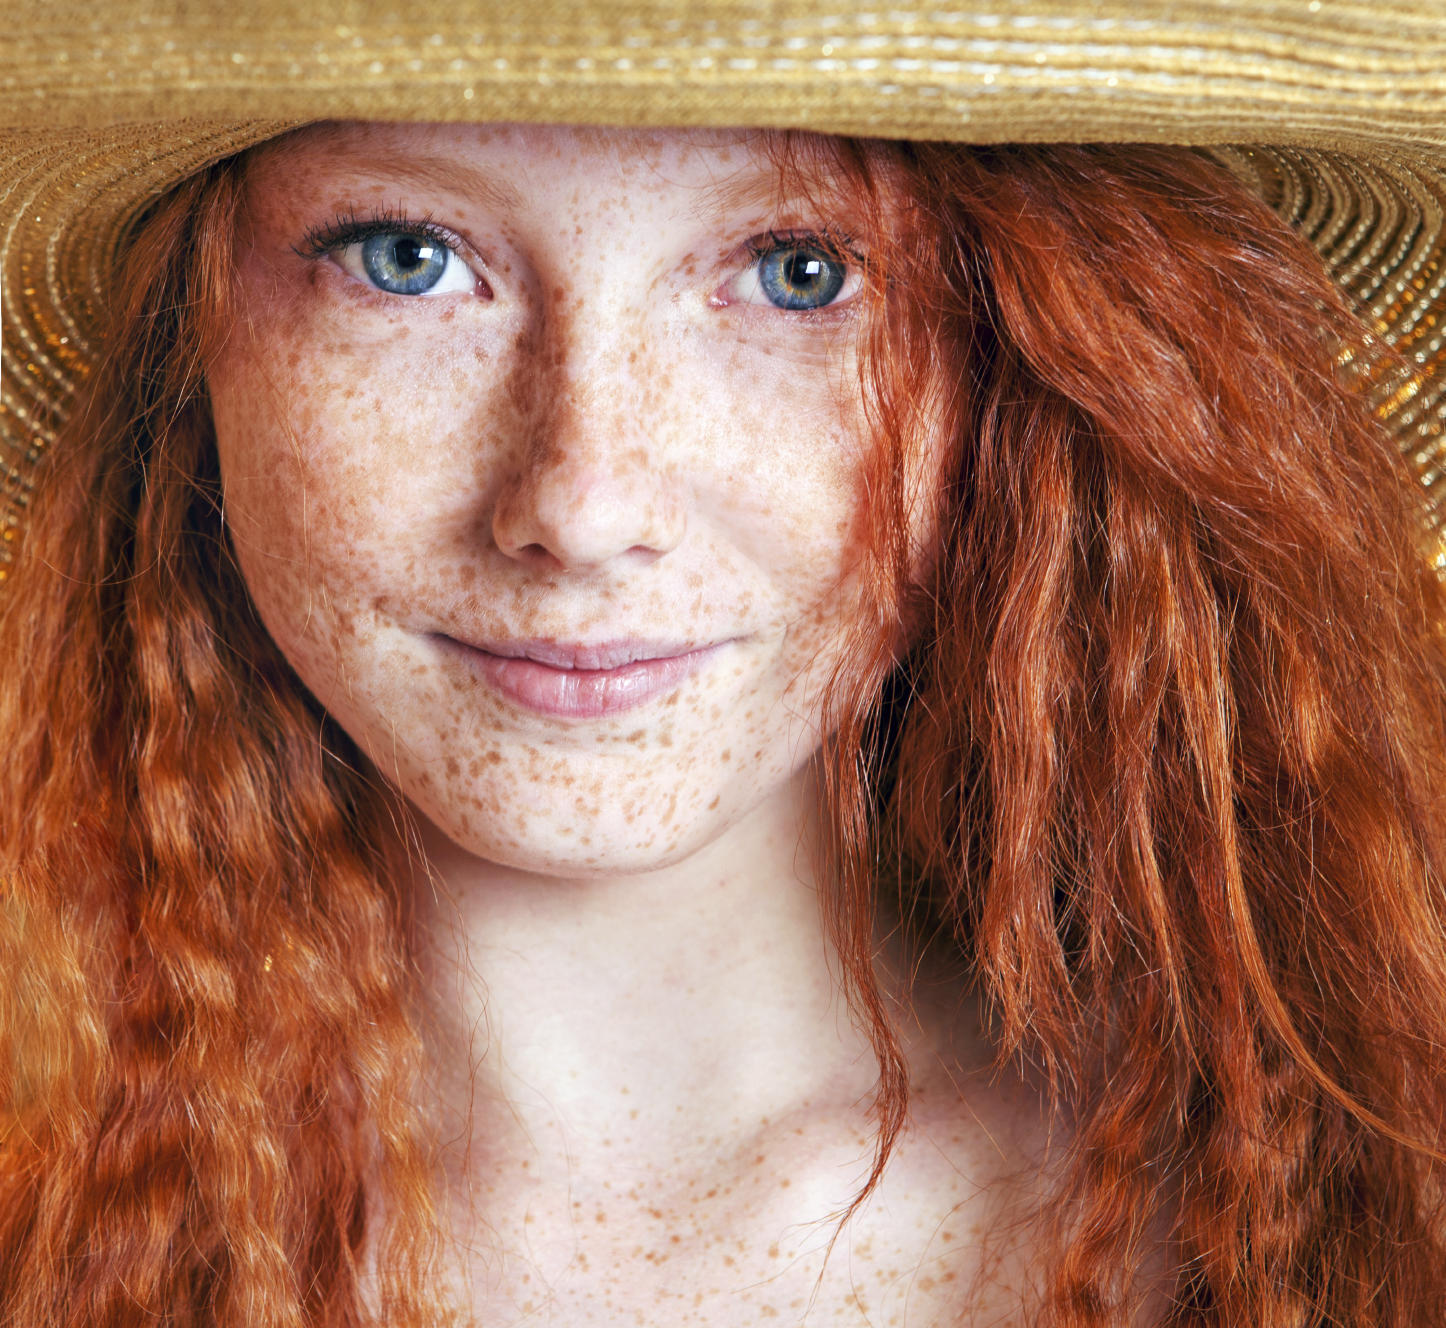 freckles redhead woman